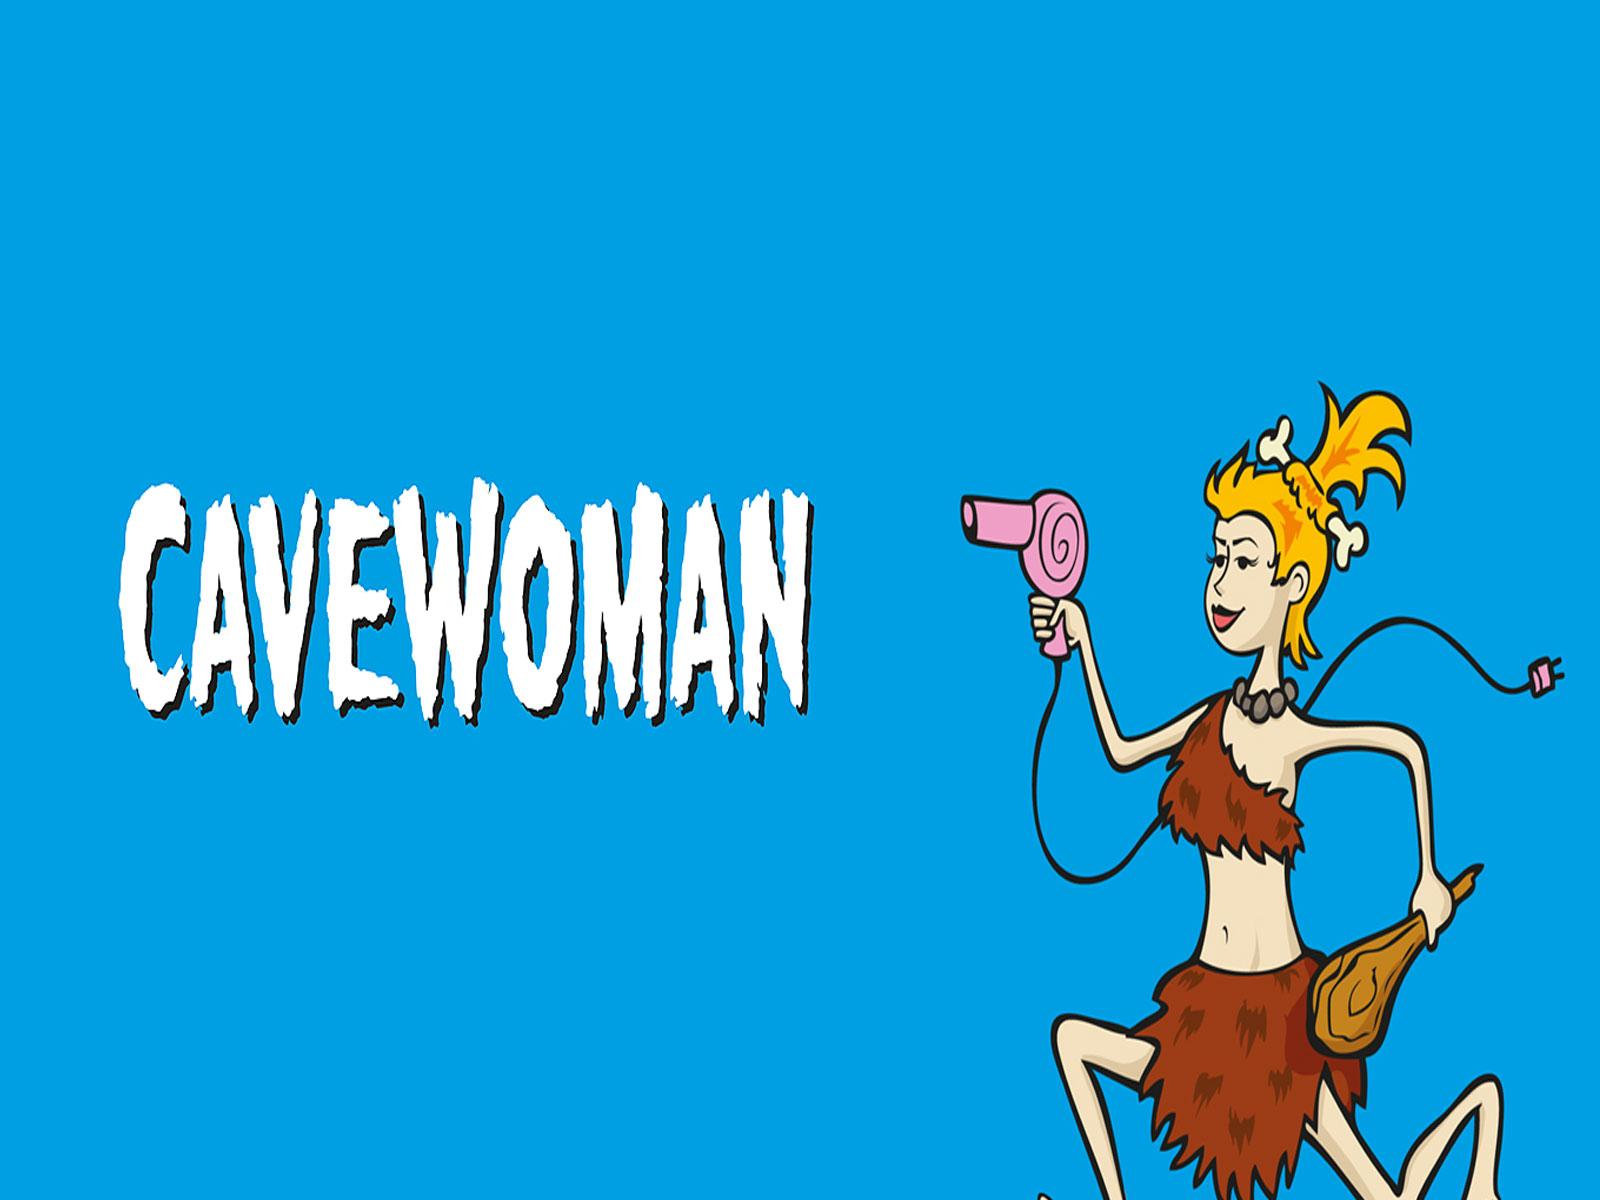 http://www.boulevardtheater.de/images/produktionen/Cavewoman-BD-Hintergrund.jpg